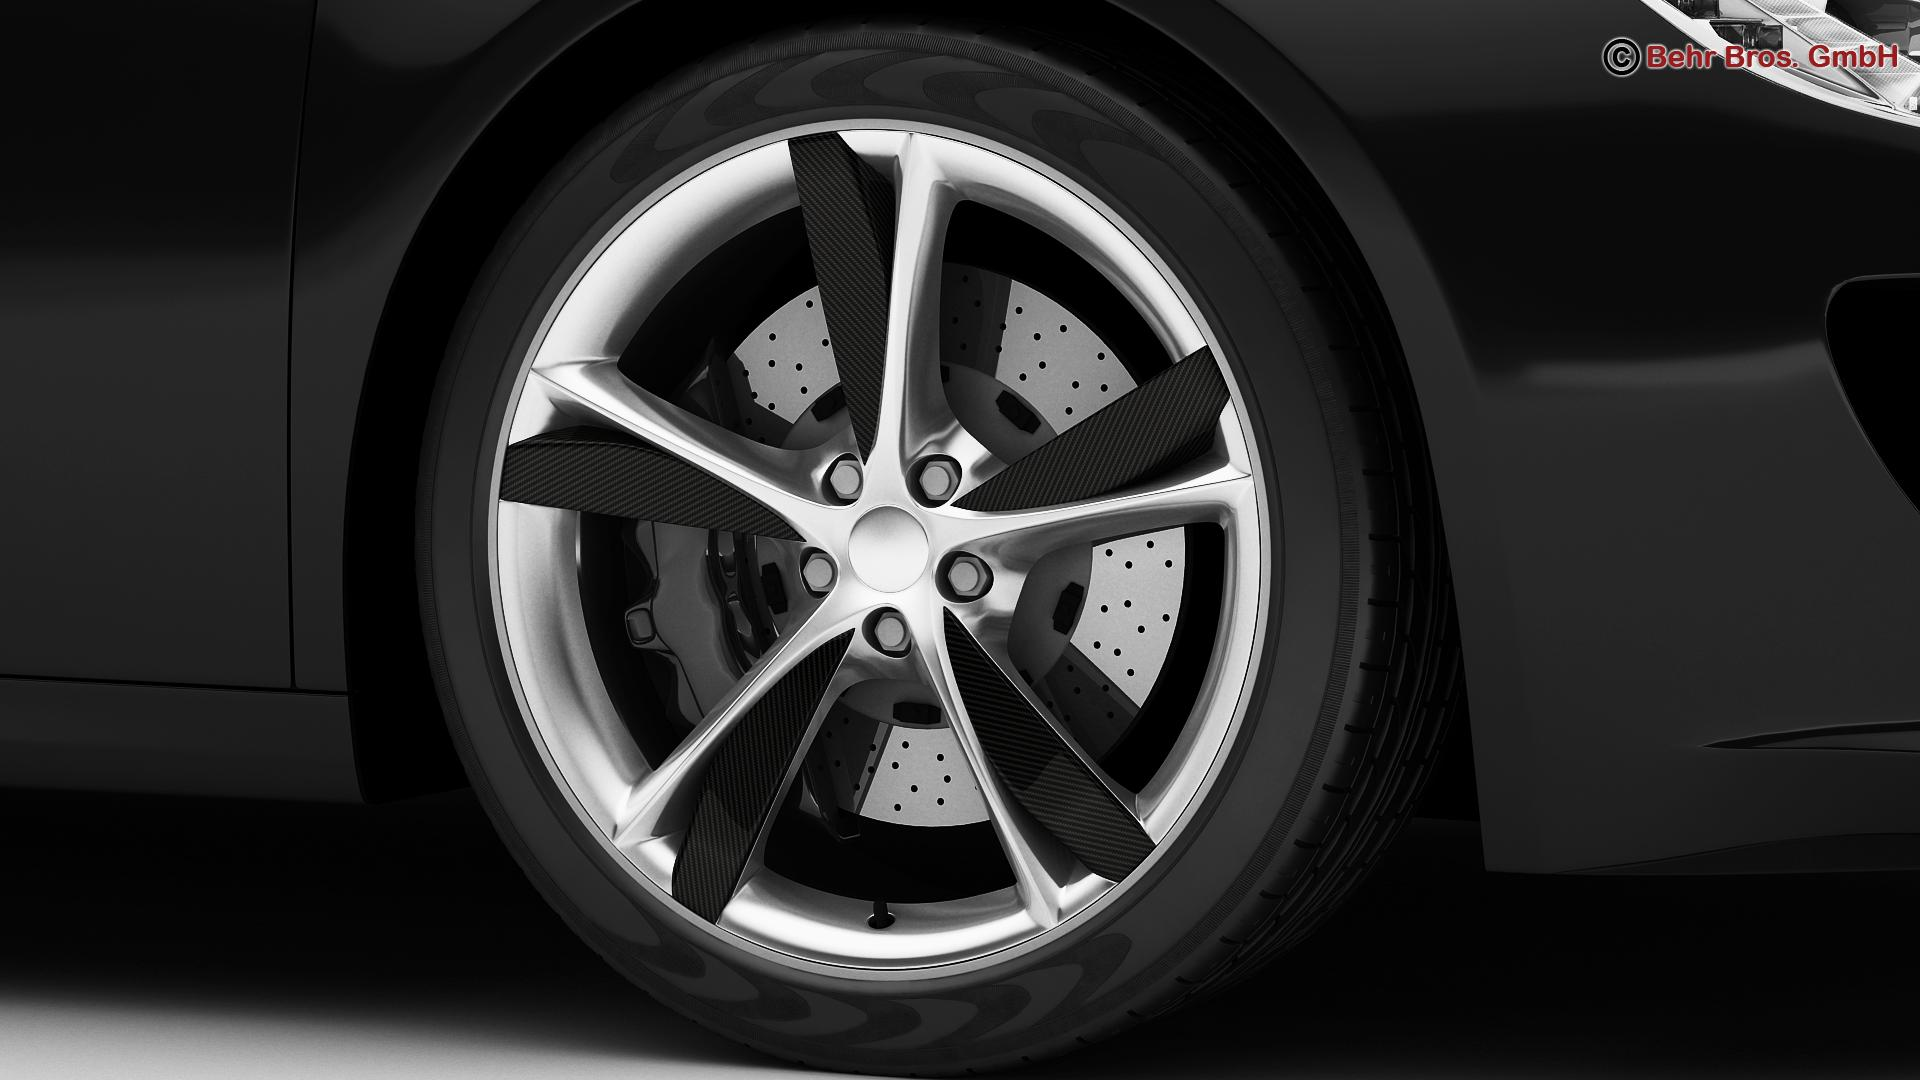 generic sports car 3d model 3ds max fbx c4d lwo ma mb obj 160529